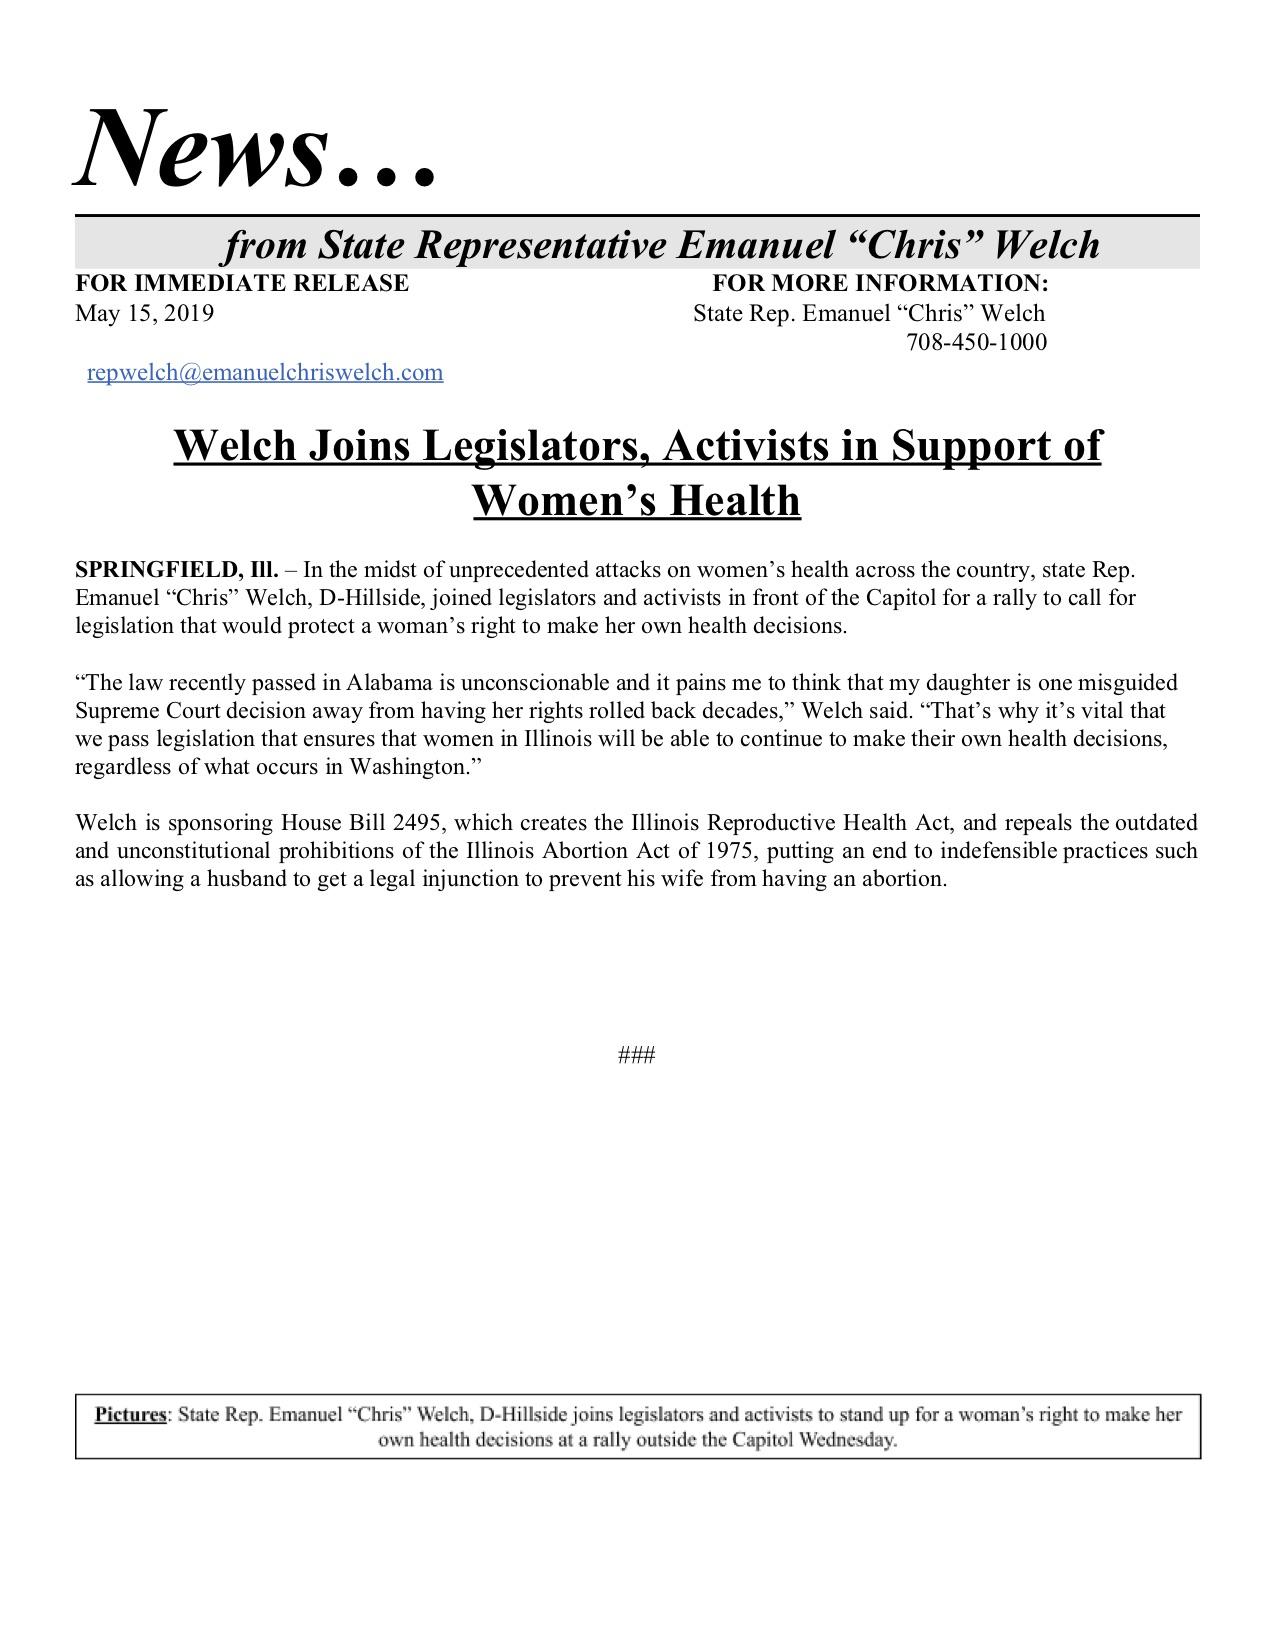 Welch Joins Legislators, Activists in Support of Women's Health  (May 15, 2019)